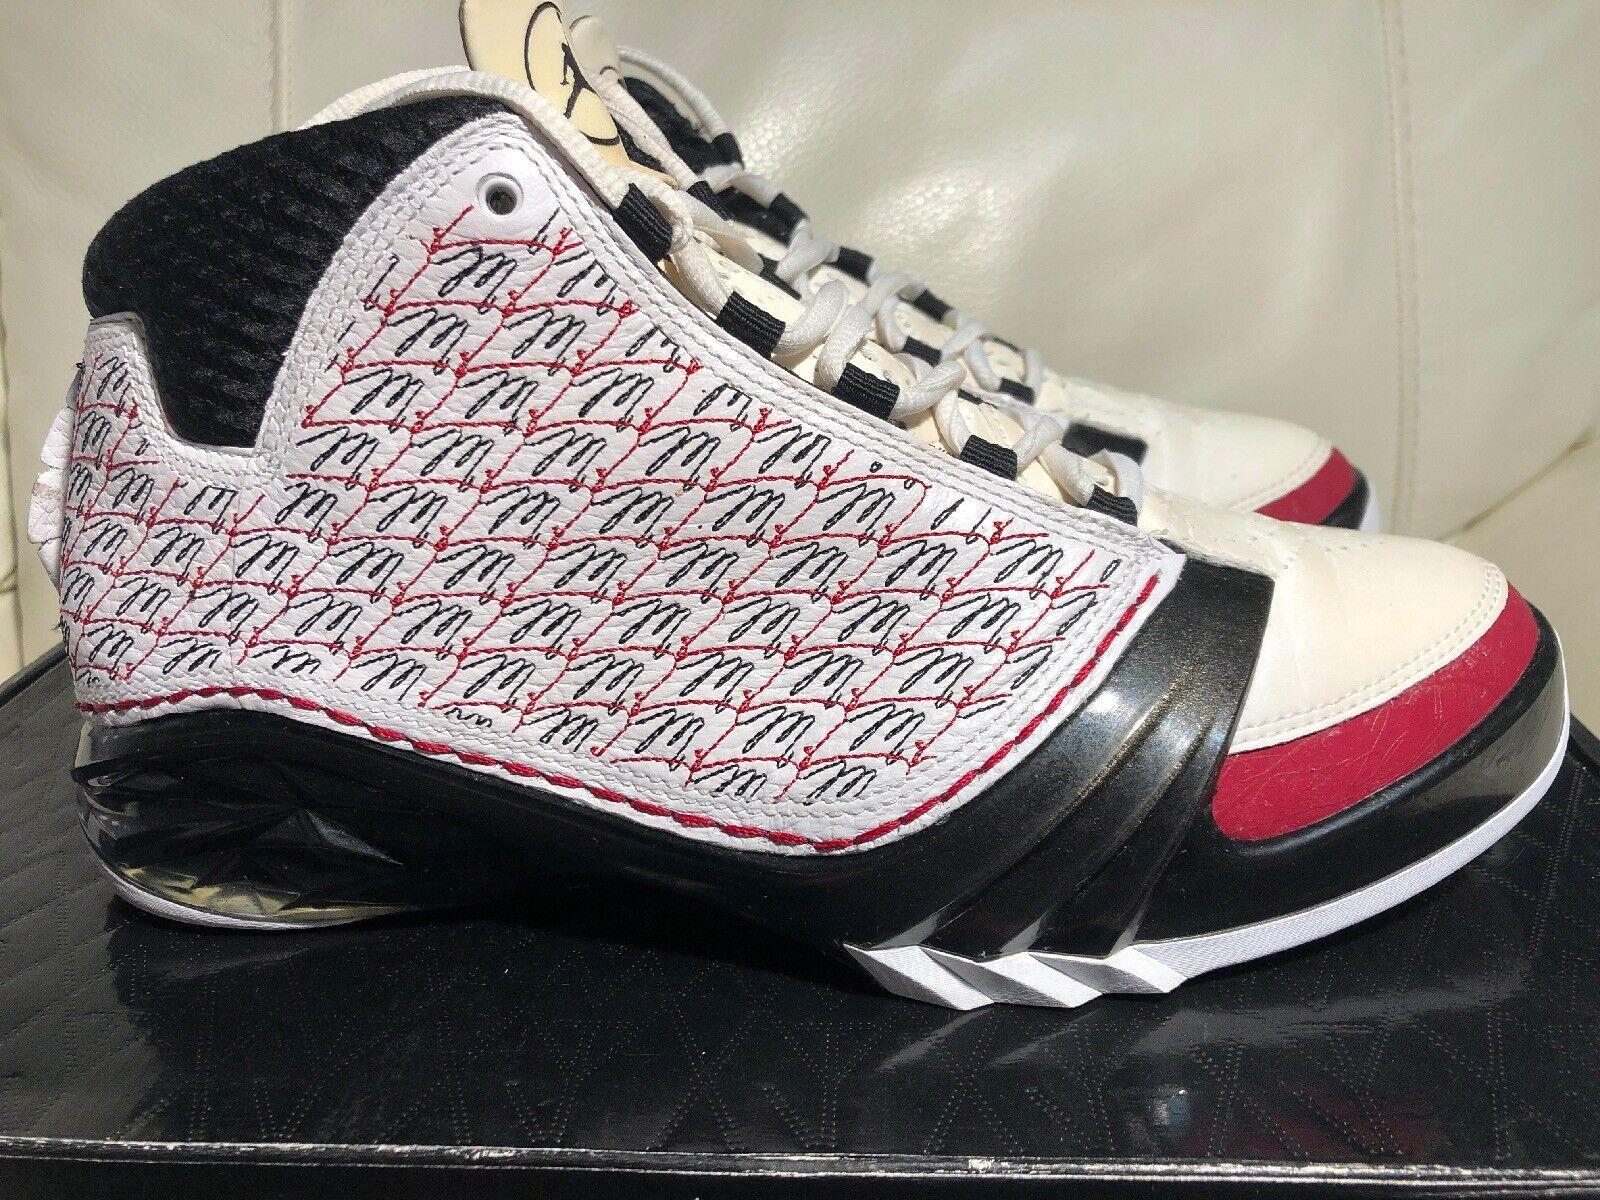 Buenas Condiciones Jordan Jordan Jordan 23 XX3 All Star Air blancooo Negro Rojo 2008 318376 -101 Talla 7.5 5dfb67